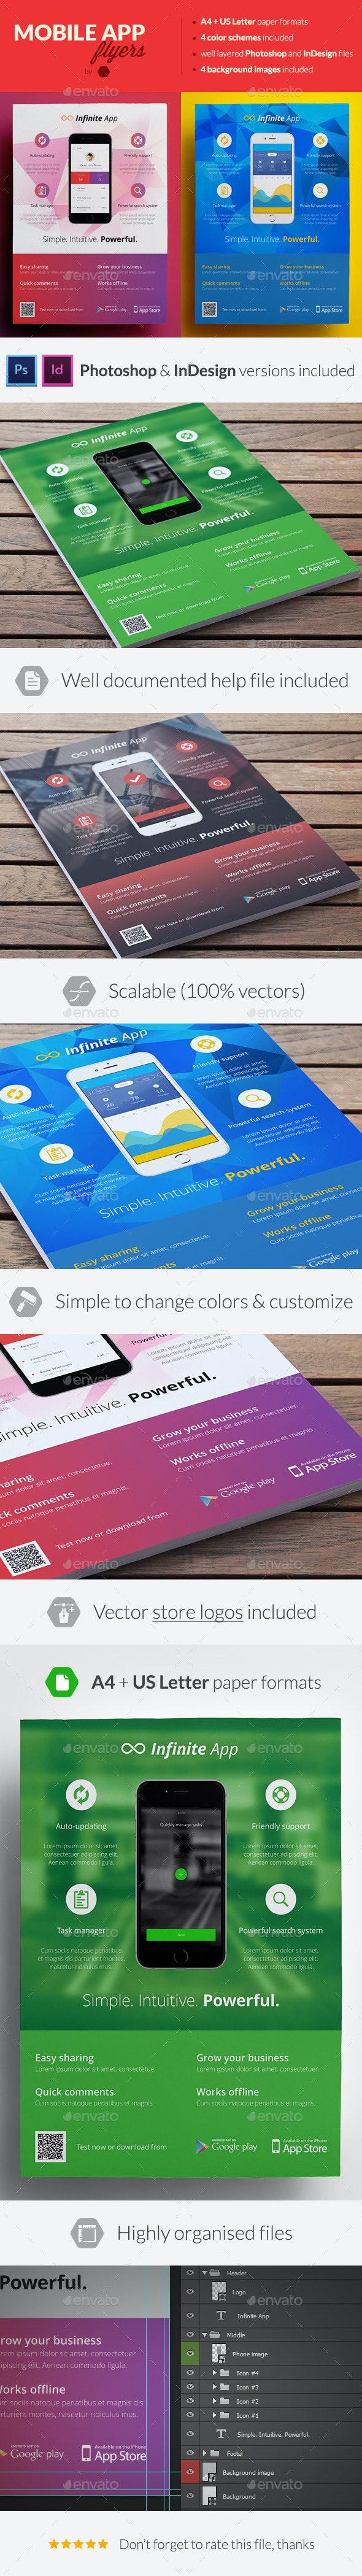 Mobile Application Promotion Flyers / Phone App 7 - Commerce Flyers